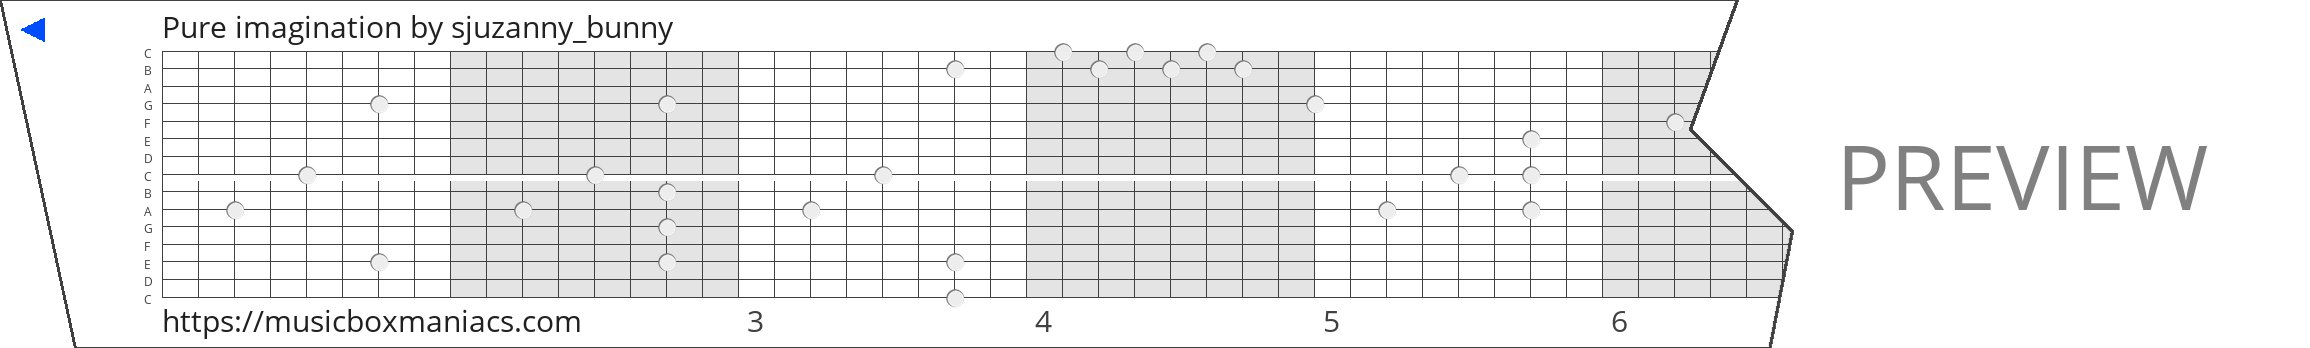 Pure imagination 15 note music box paper strip